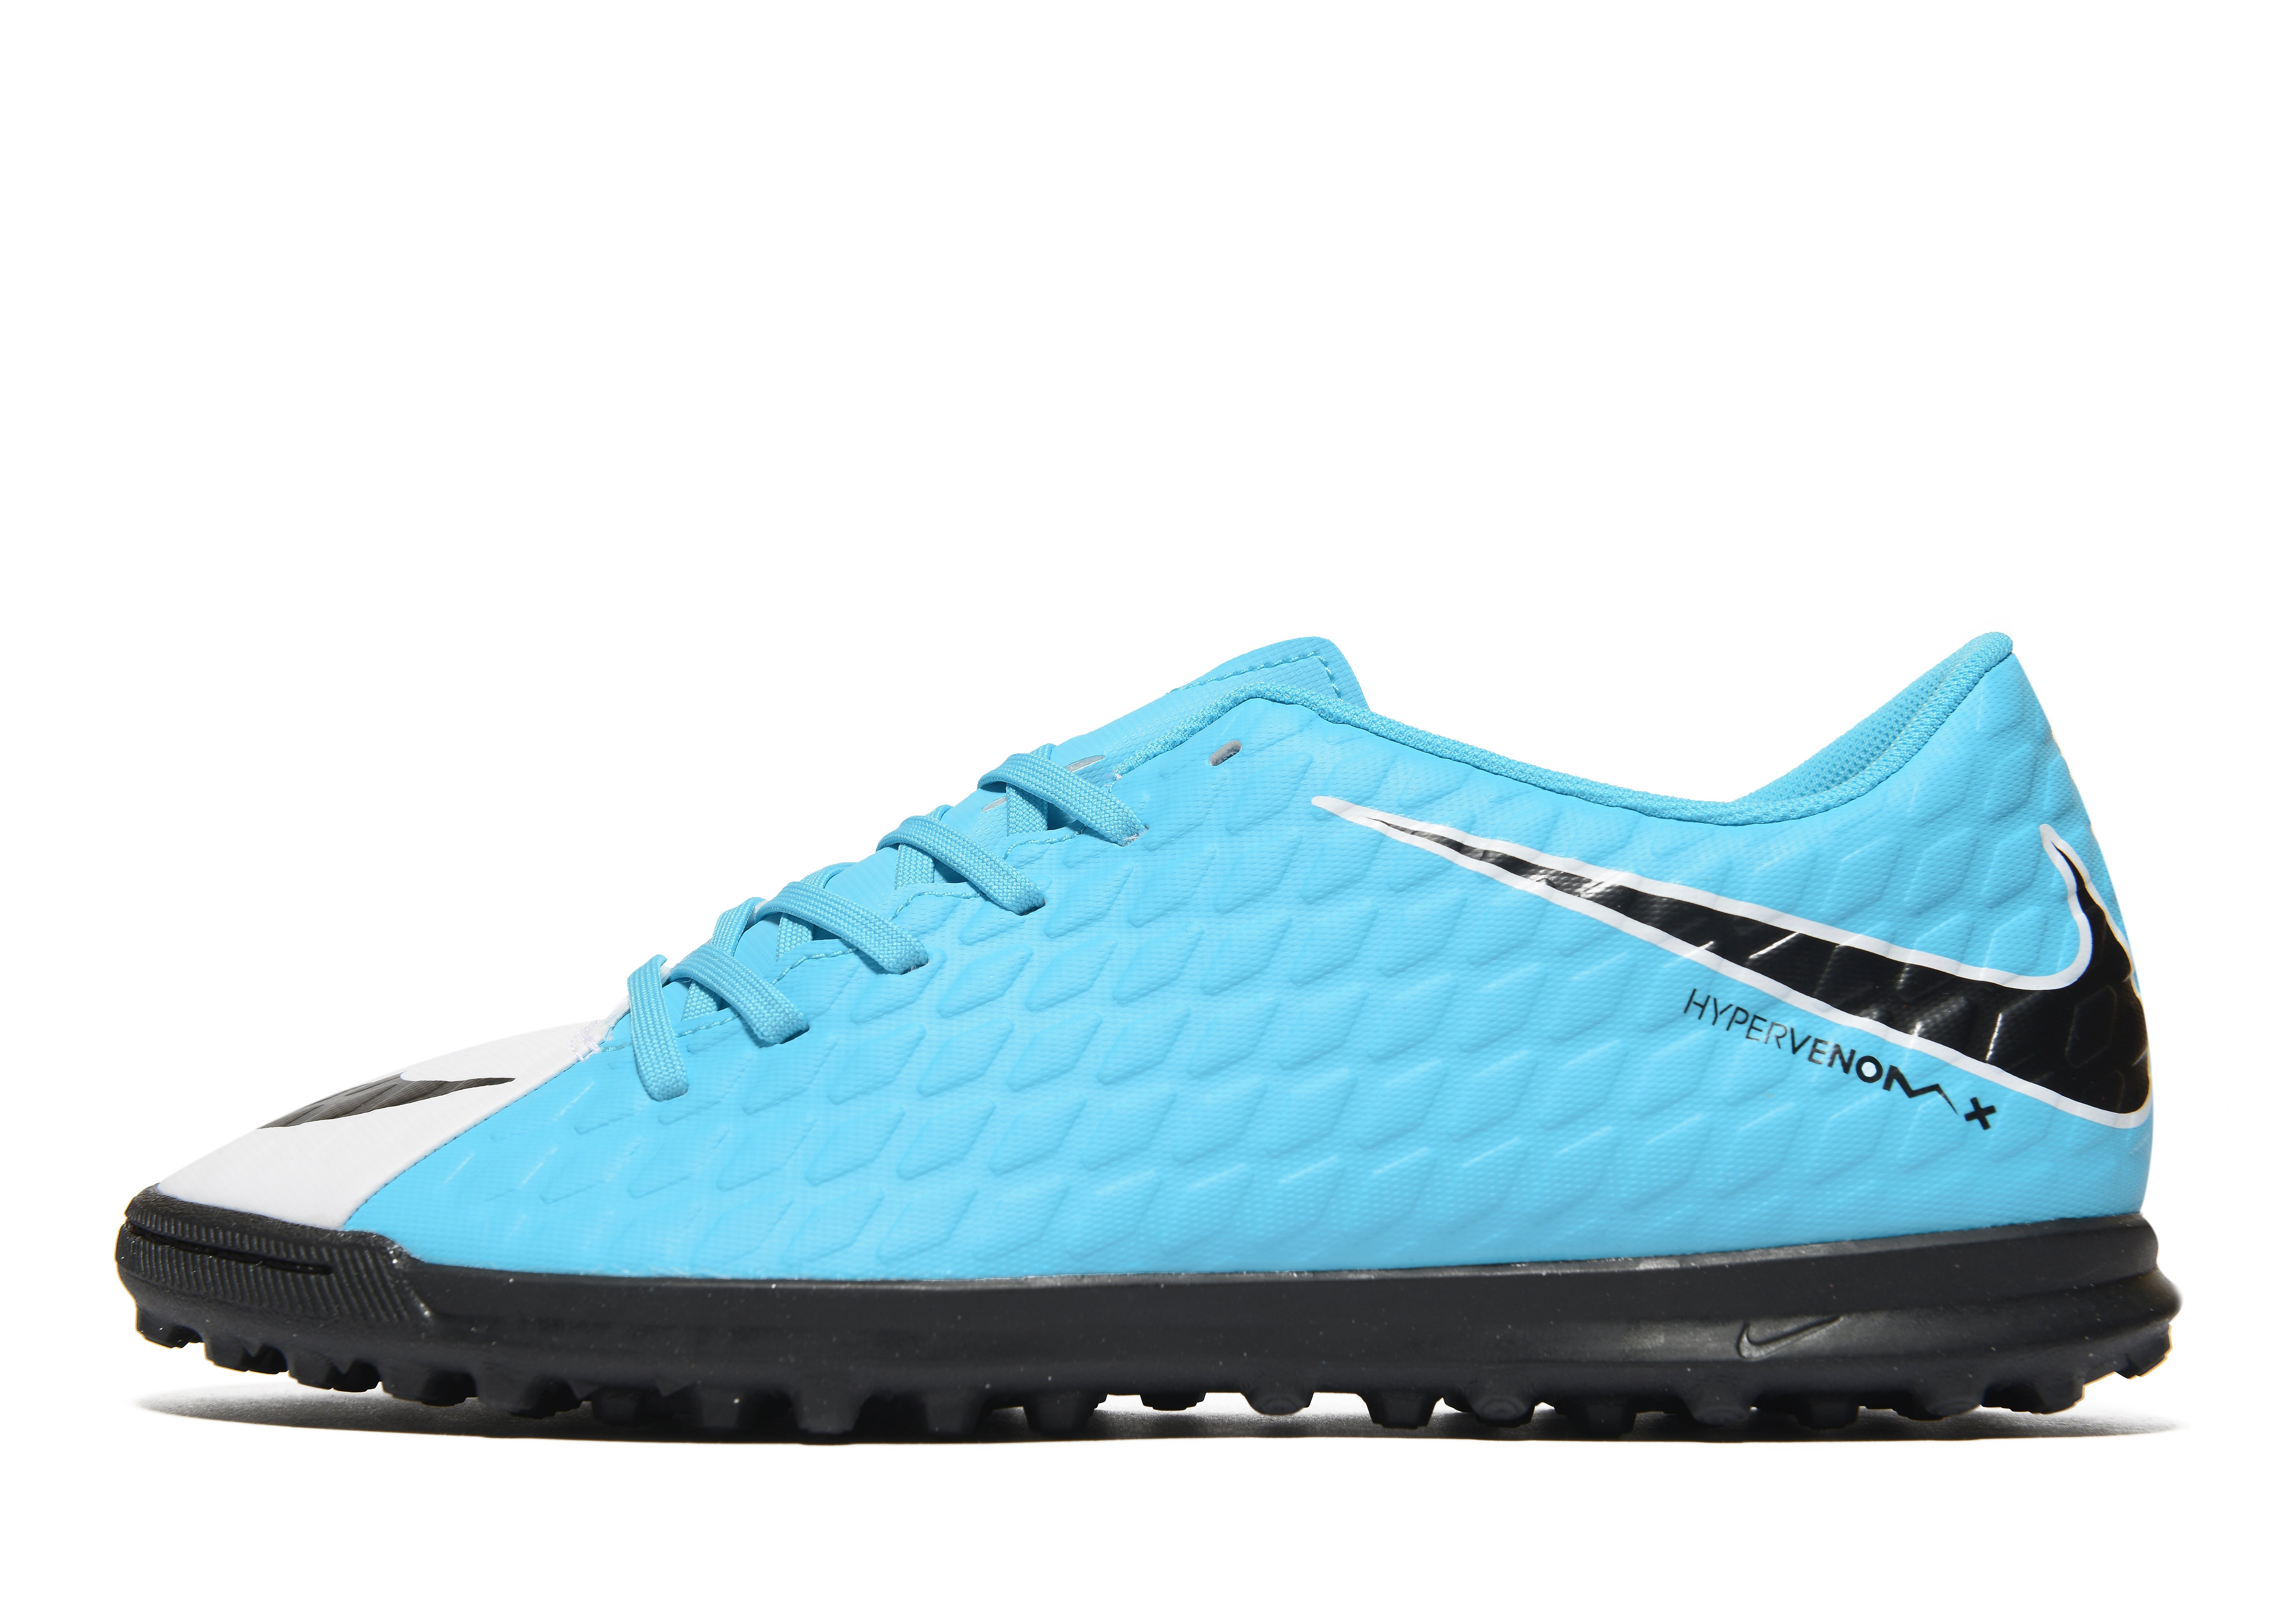 Nike Motion Blur Hypervenom Phade Men's TF Football Boots